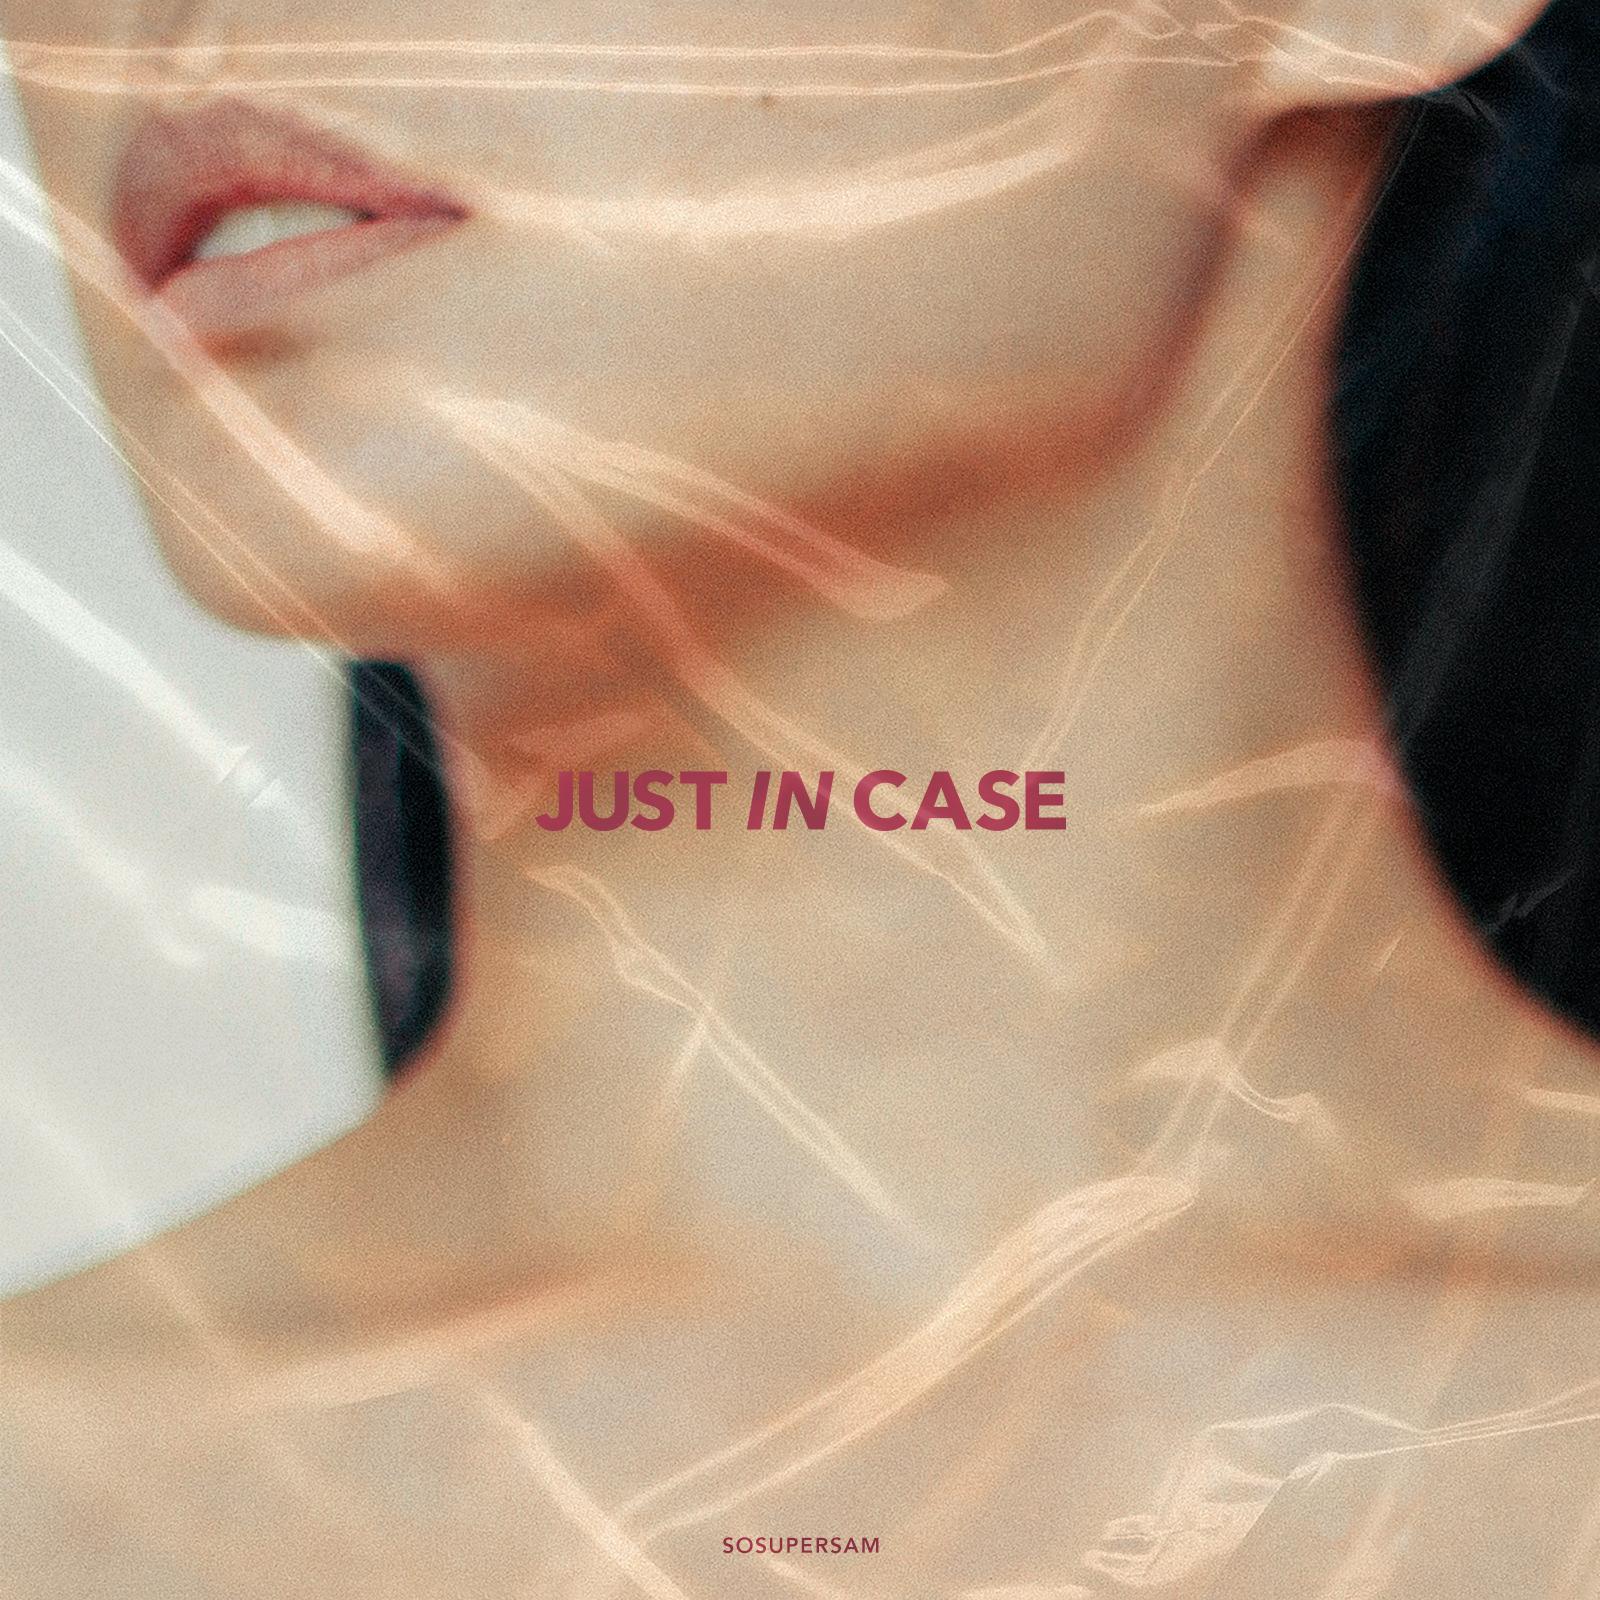 JUST-IN-CASE.jpg